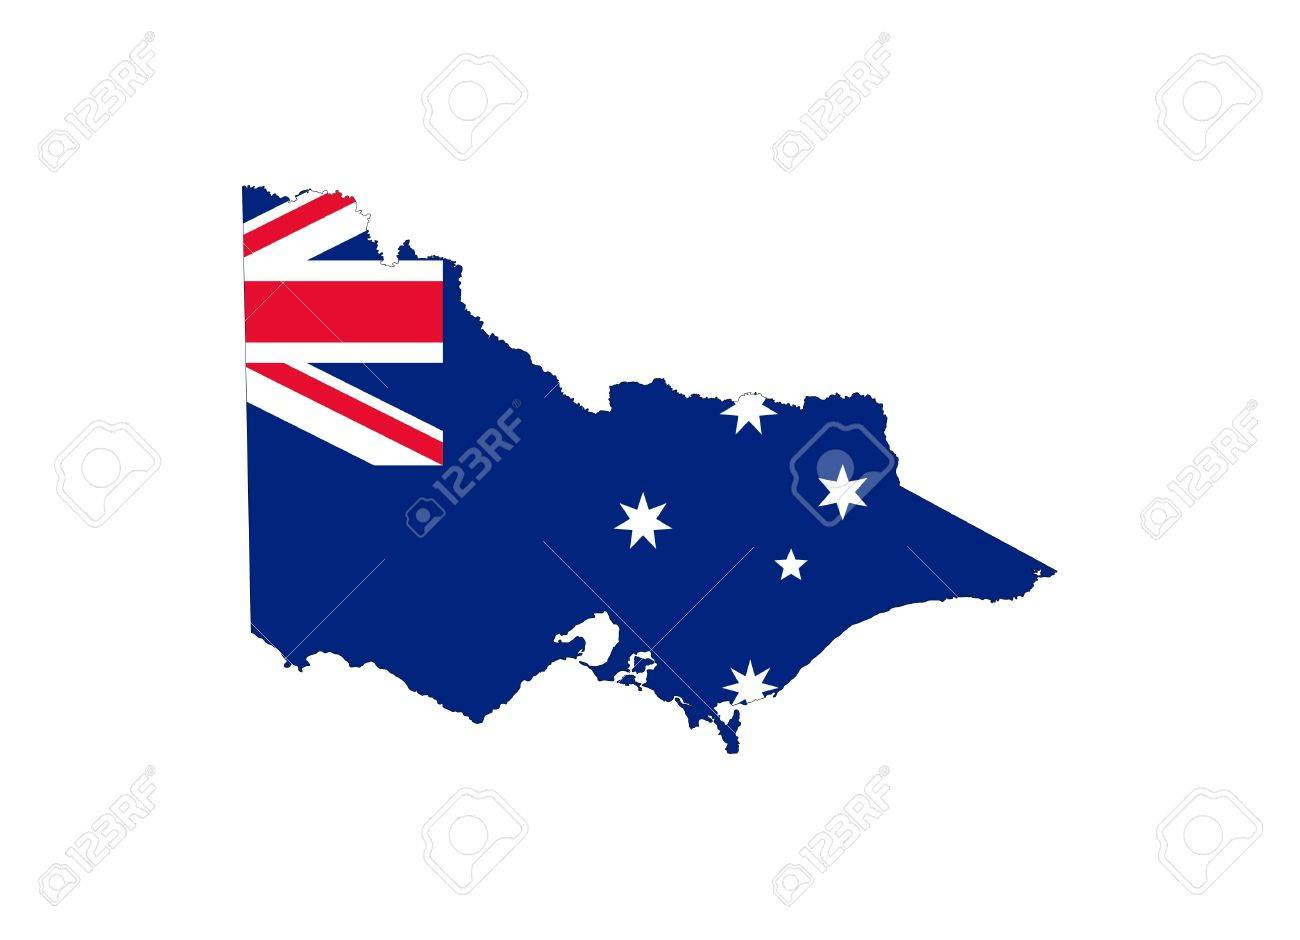 Victoria State Australia Map.State Flag Of Victoria Australia On Map Isolated On White